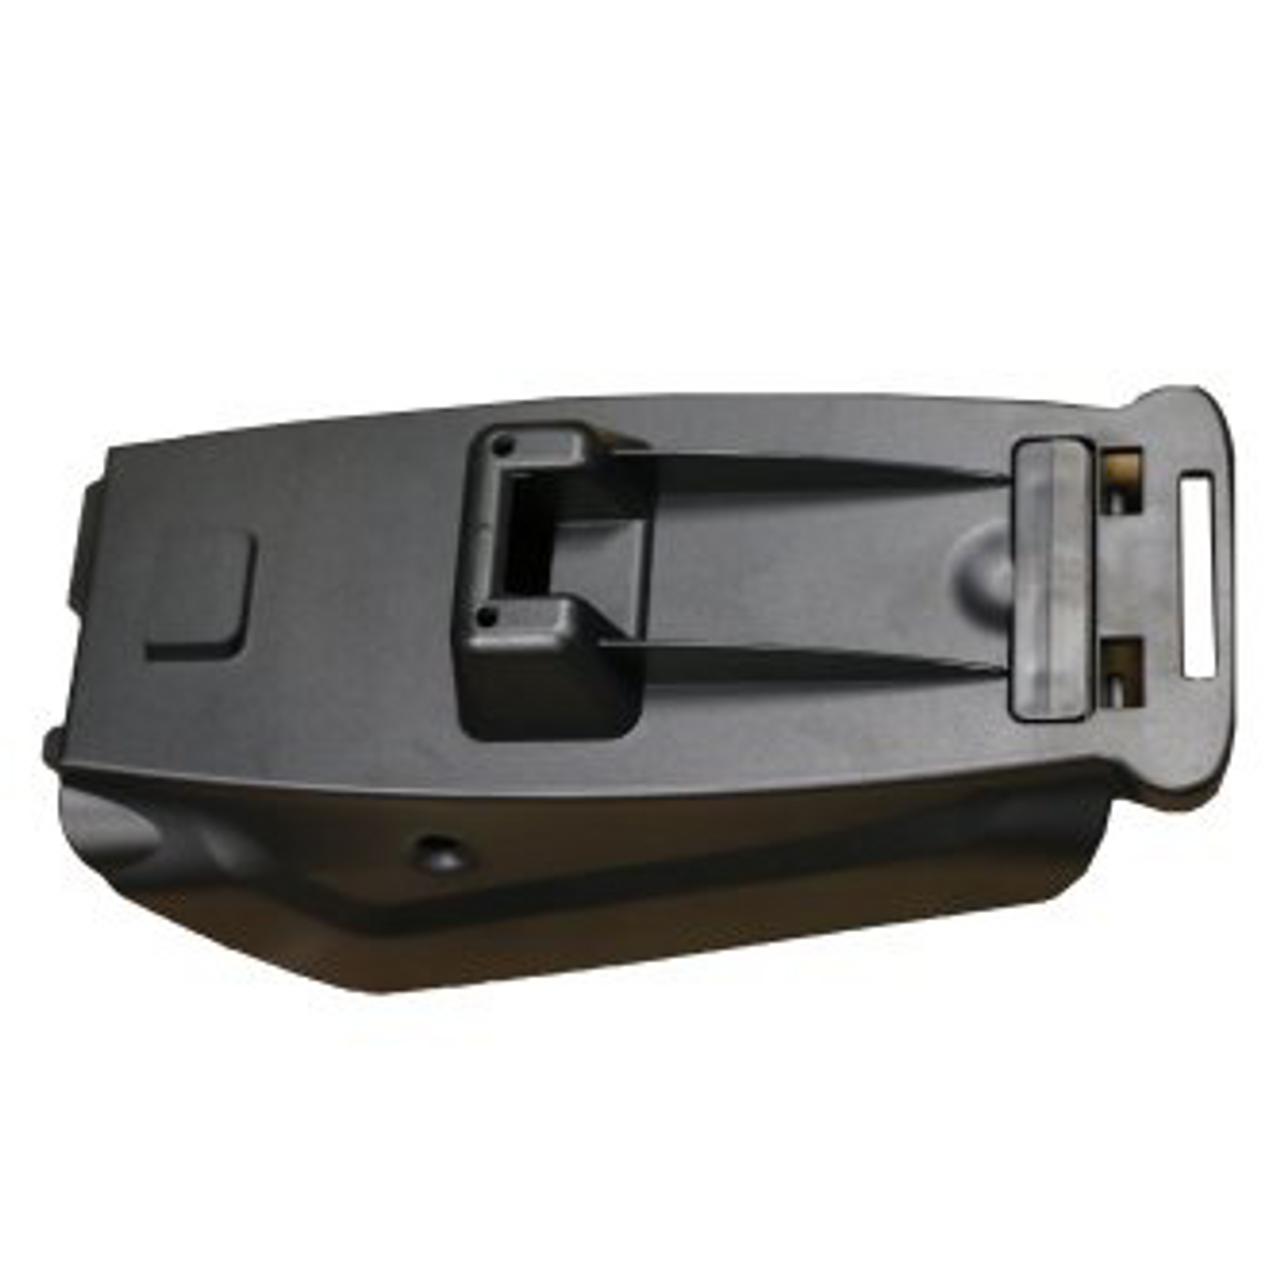 Ingenico Desk 3000 and 5000 Series FlexiPole POS Drive-Thru Handle